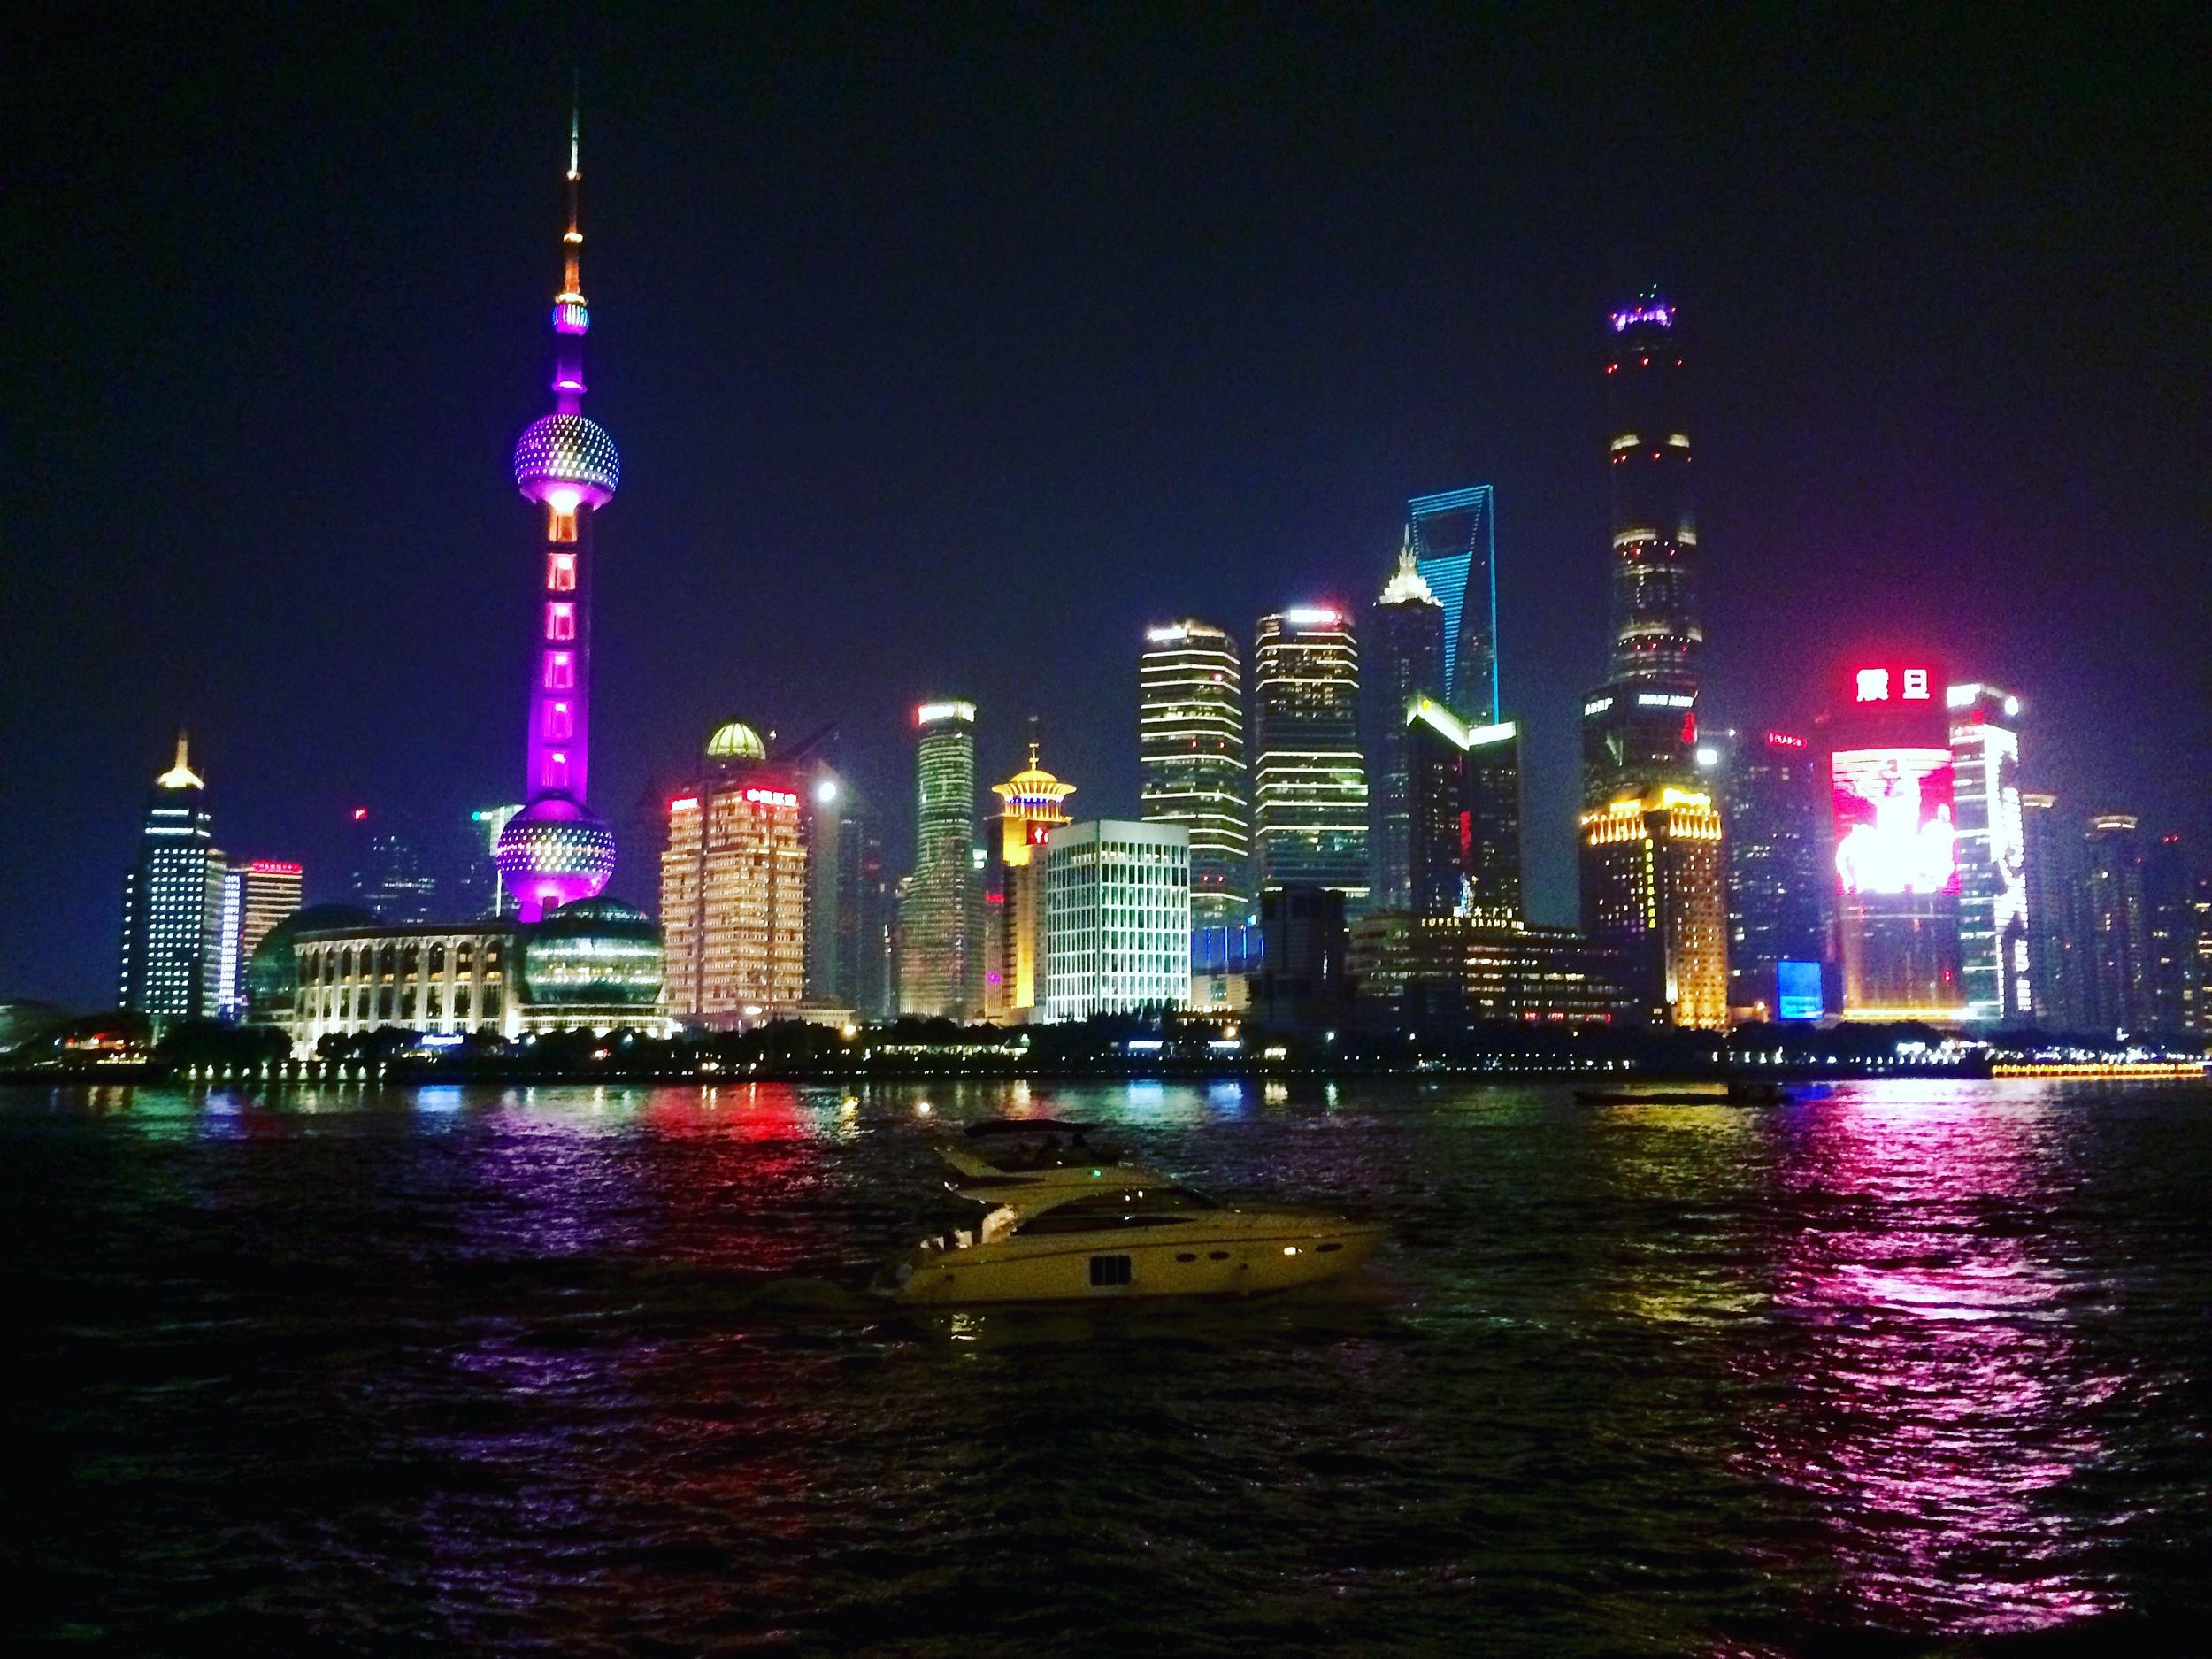 view from the Bund in Shanghai